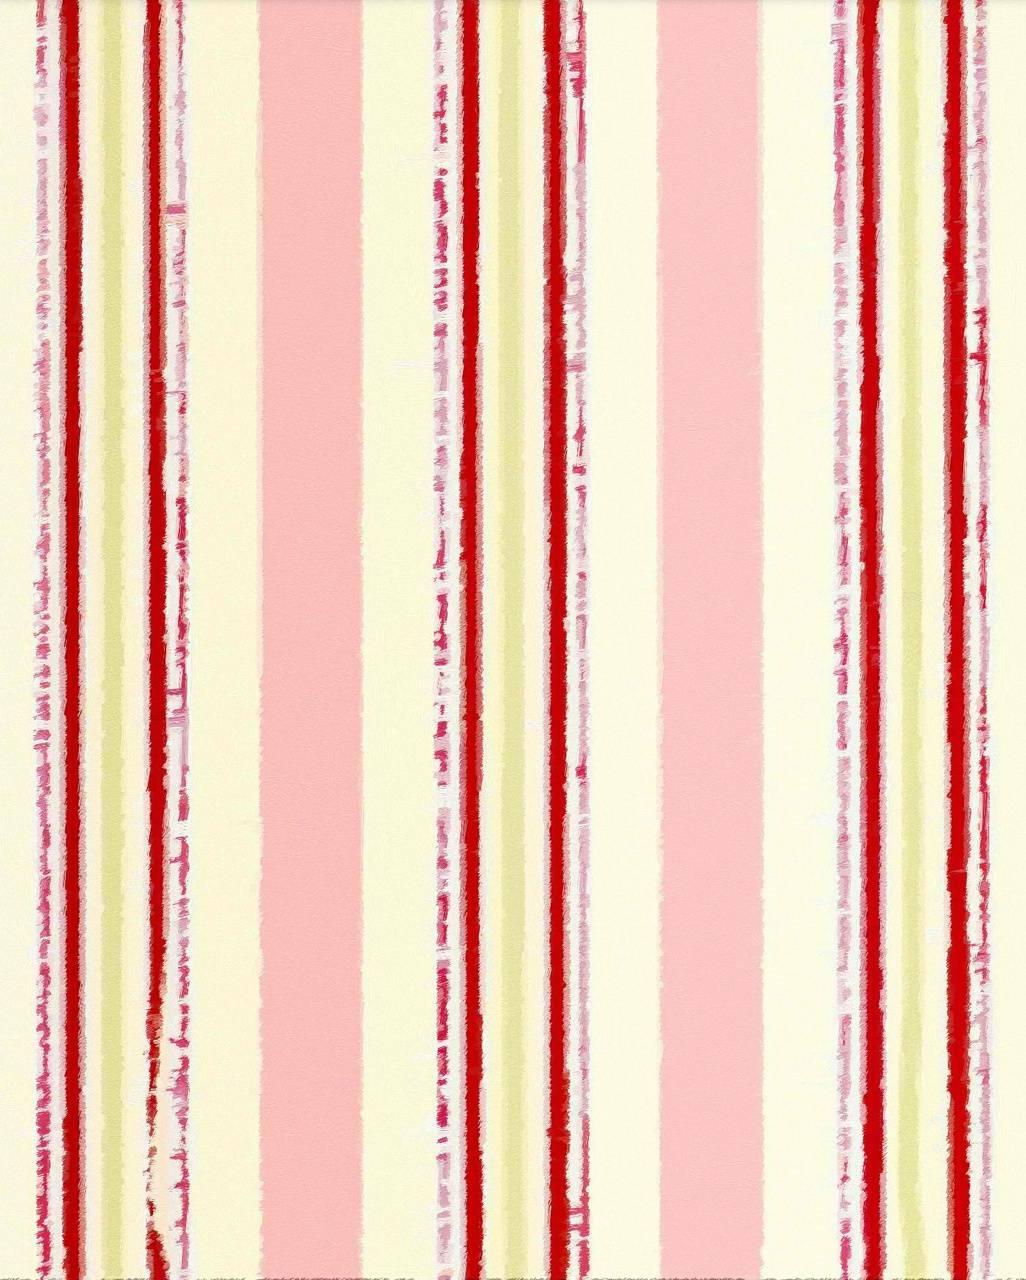 Stripes Ahead